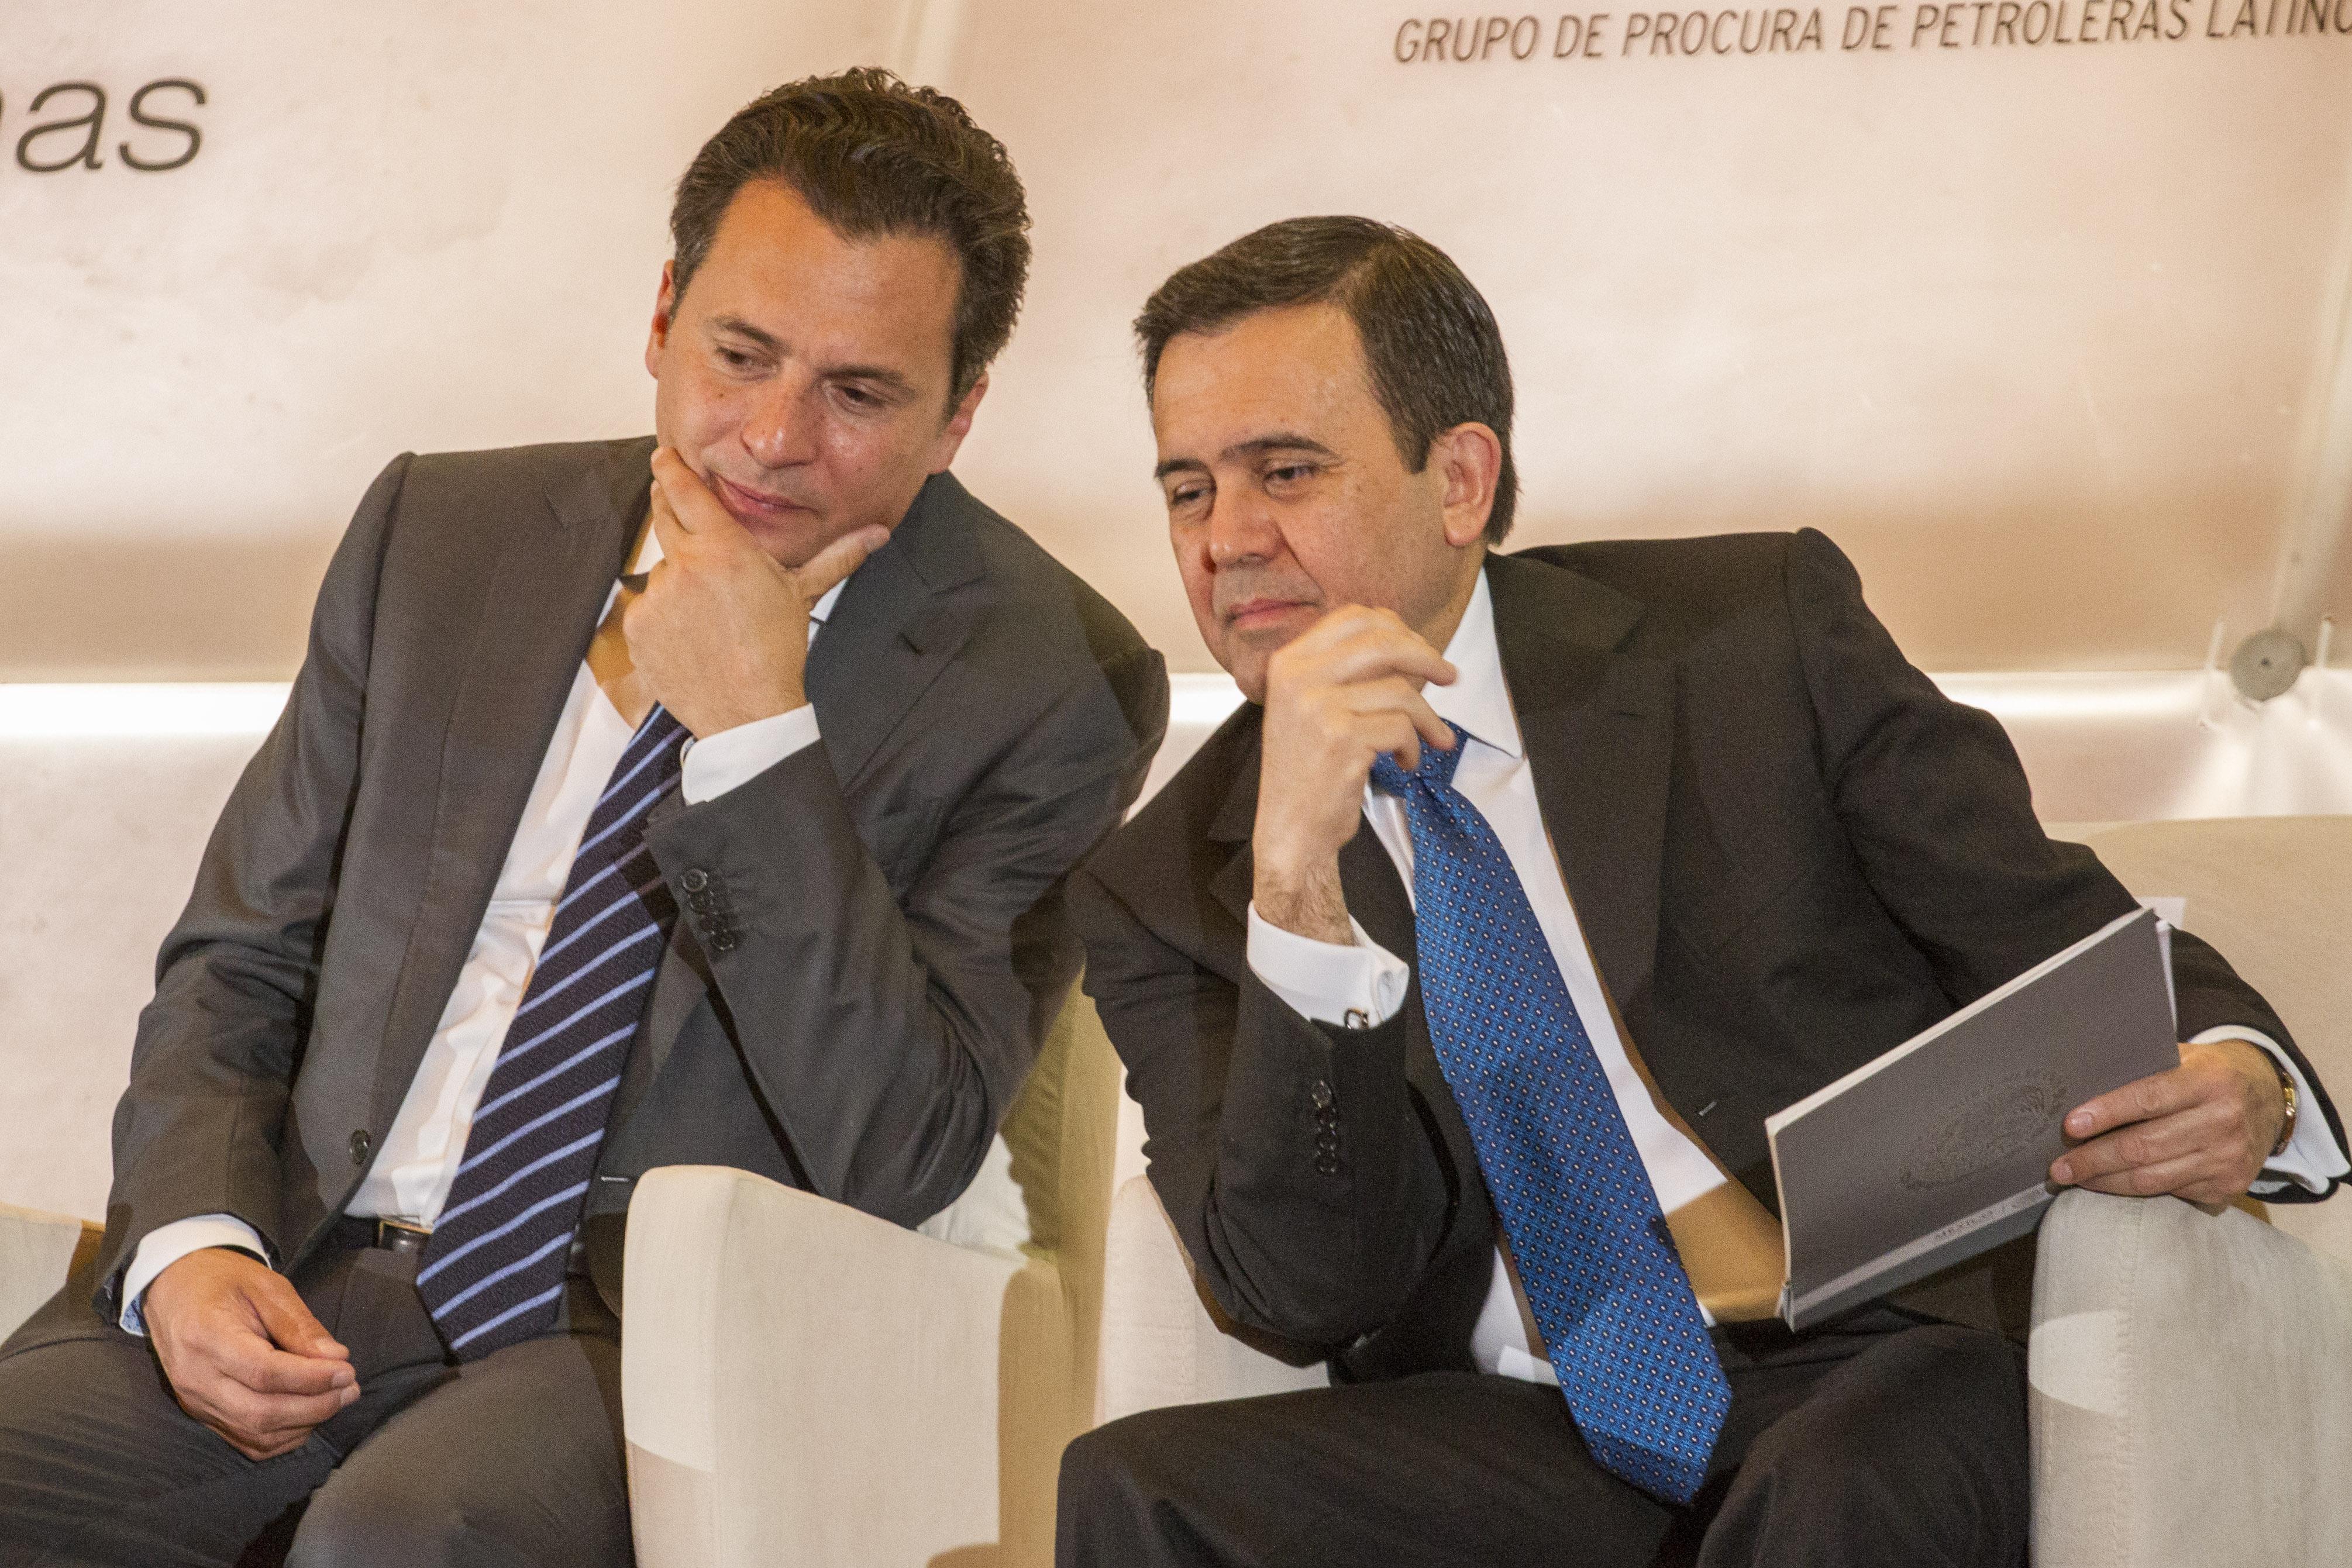 Emilio Lozoya Austin, exdirector de Pemex, e Ildefonso Guajardo. FOTO: ISAAC ESQUIVEL /CUARTOSCURO.COM